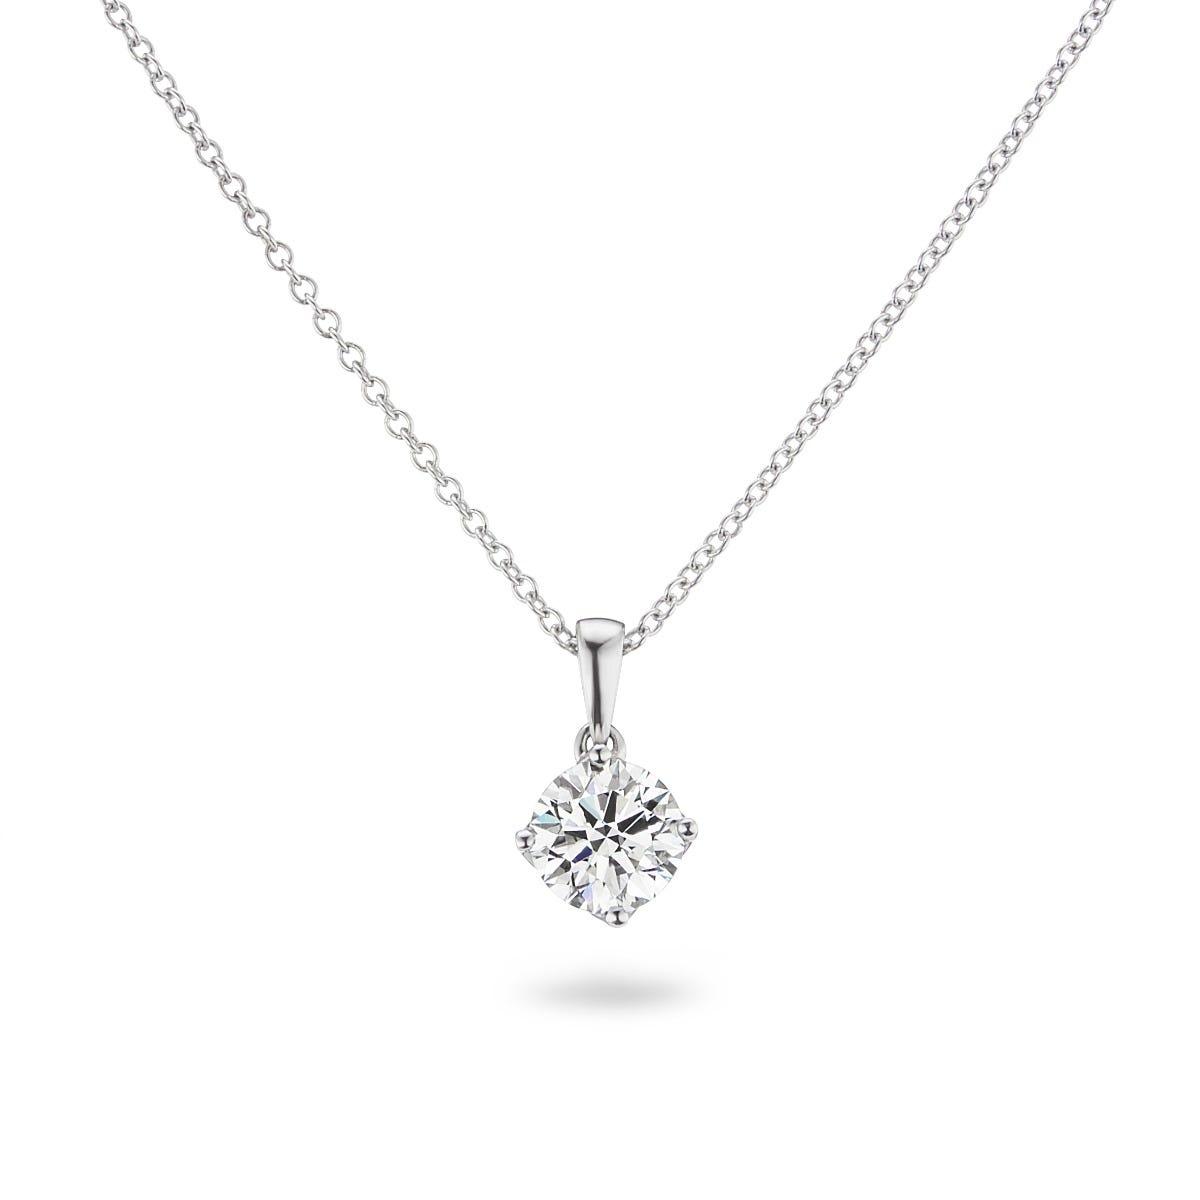 Lab Grown 1 1/4ct. Diamond 4-Prong Pendant in 14k White Gold